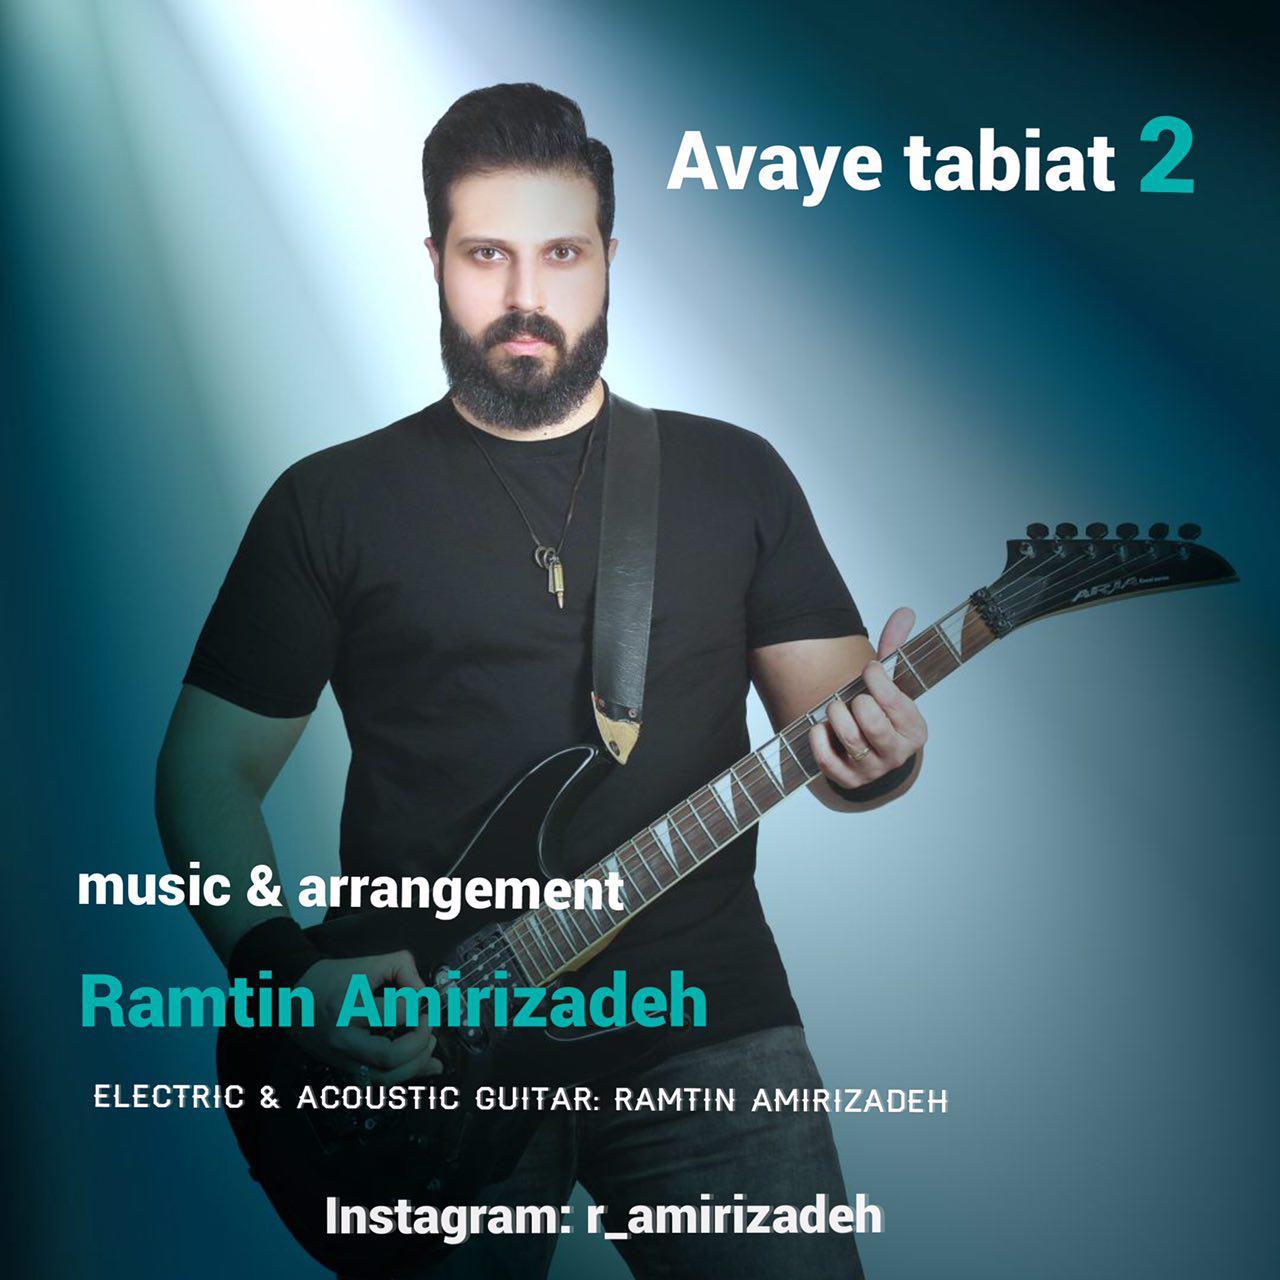 http://dl.rasanejavan.com/RadioJavan%201396/Dey%2096/08/Avaye%20tabiat%202-Ramtin%20Amirizadeh.jpg